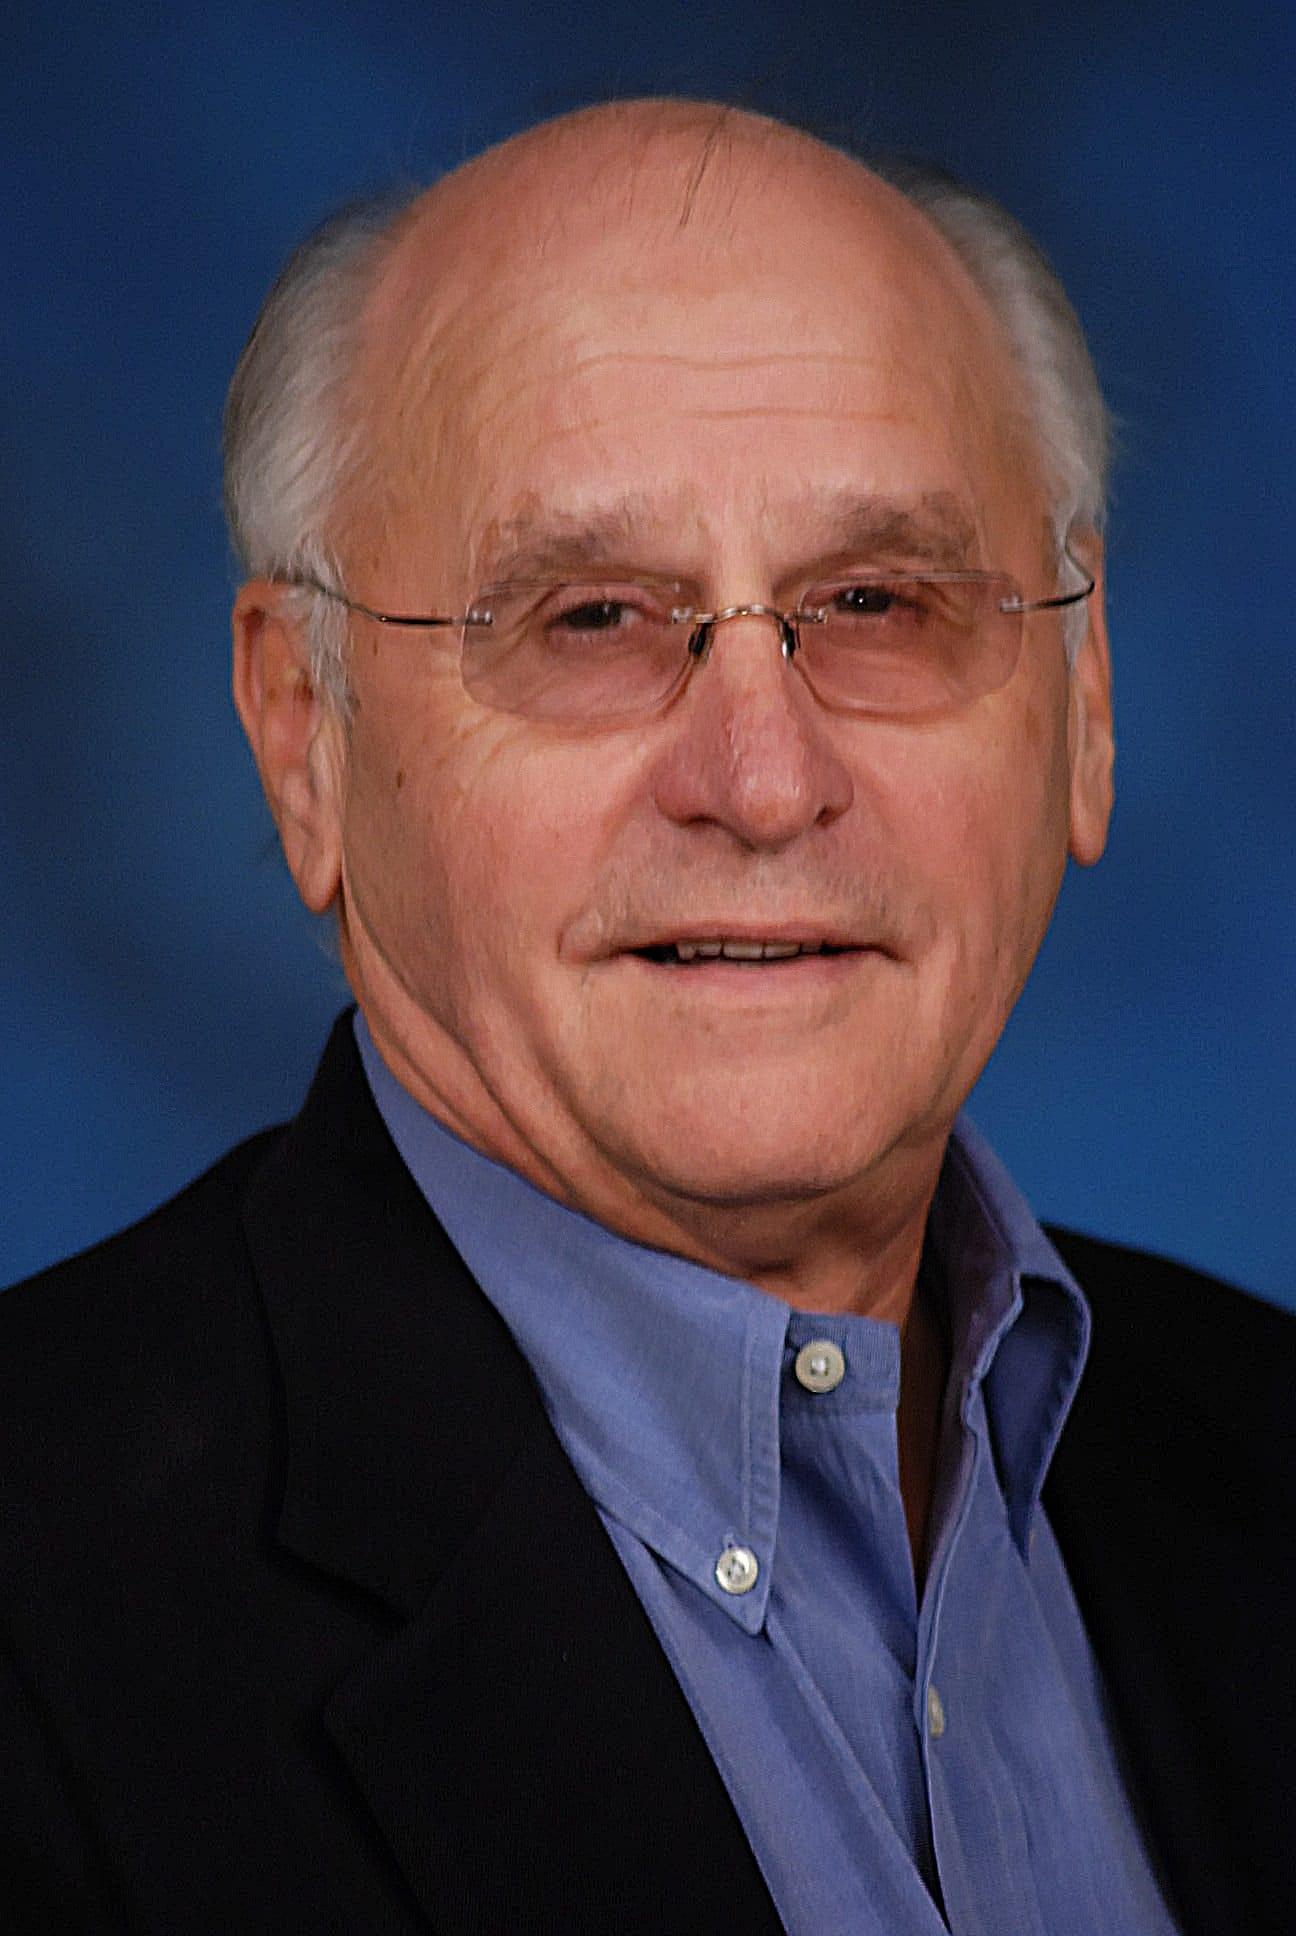 Mike Foster - Innovate Mississippi mentor